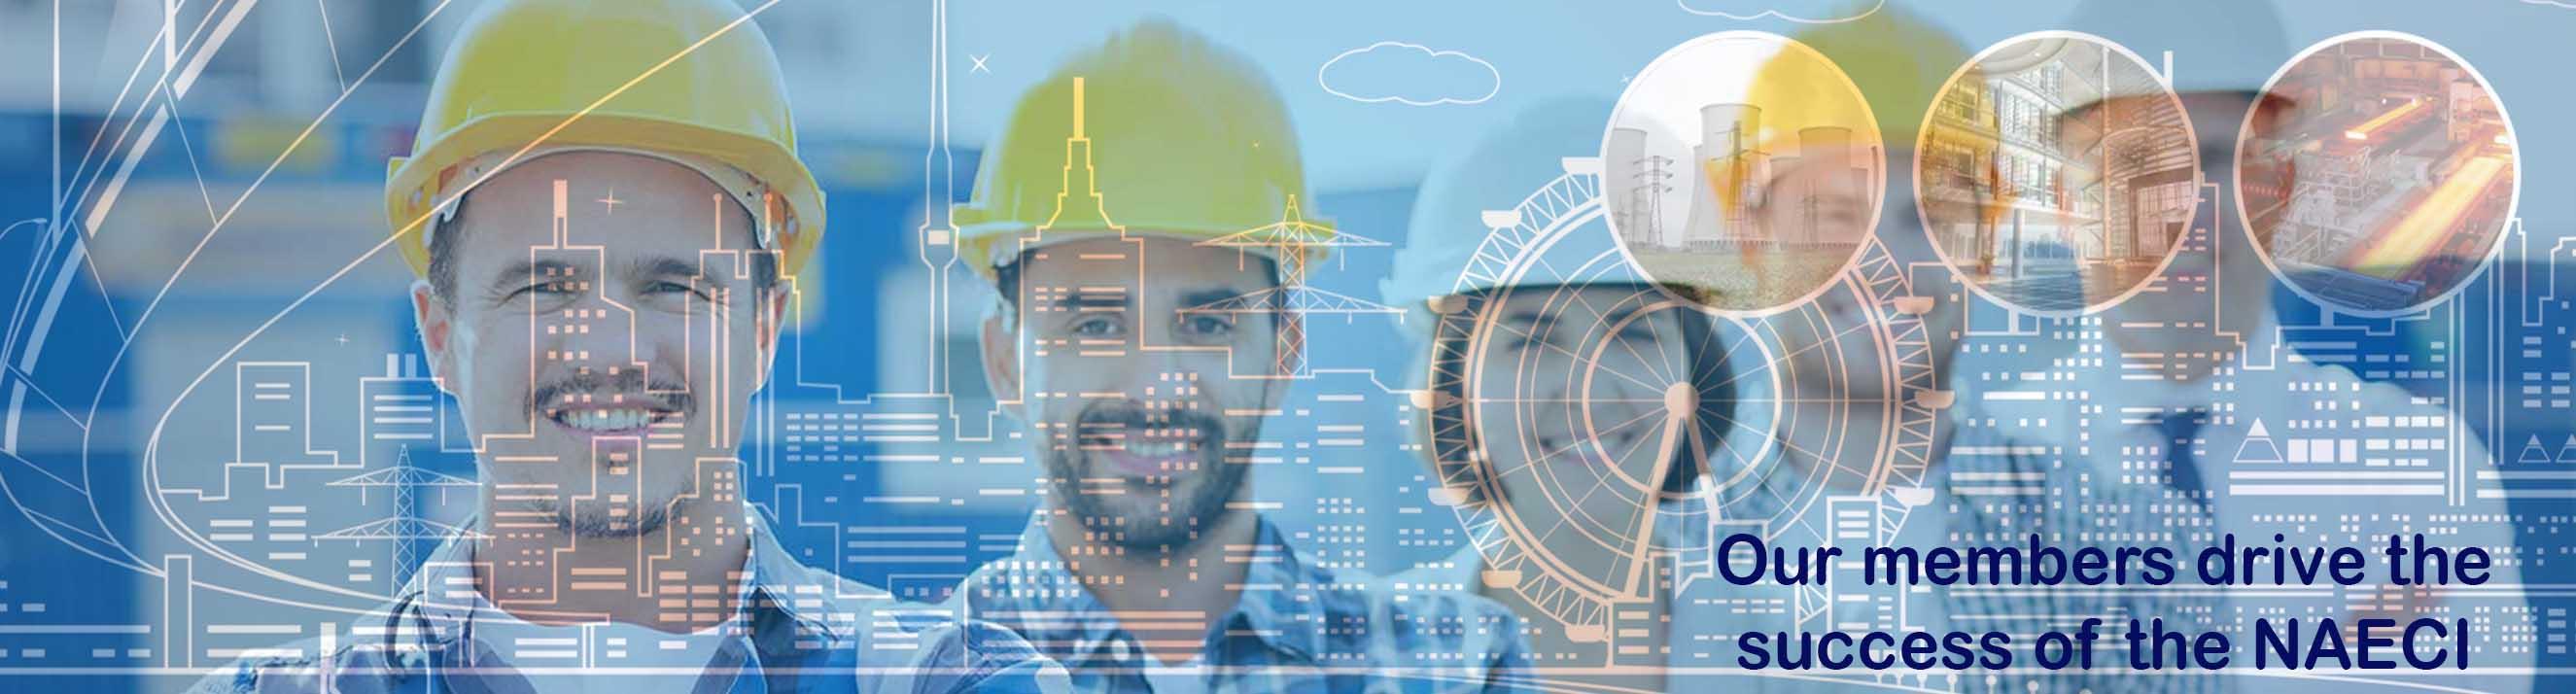 Engineering Construction Industry Association